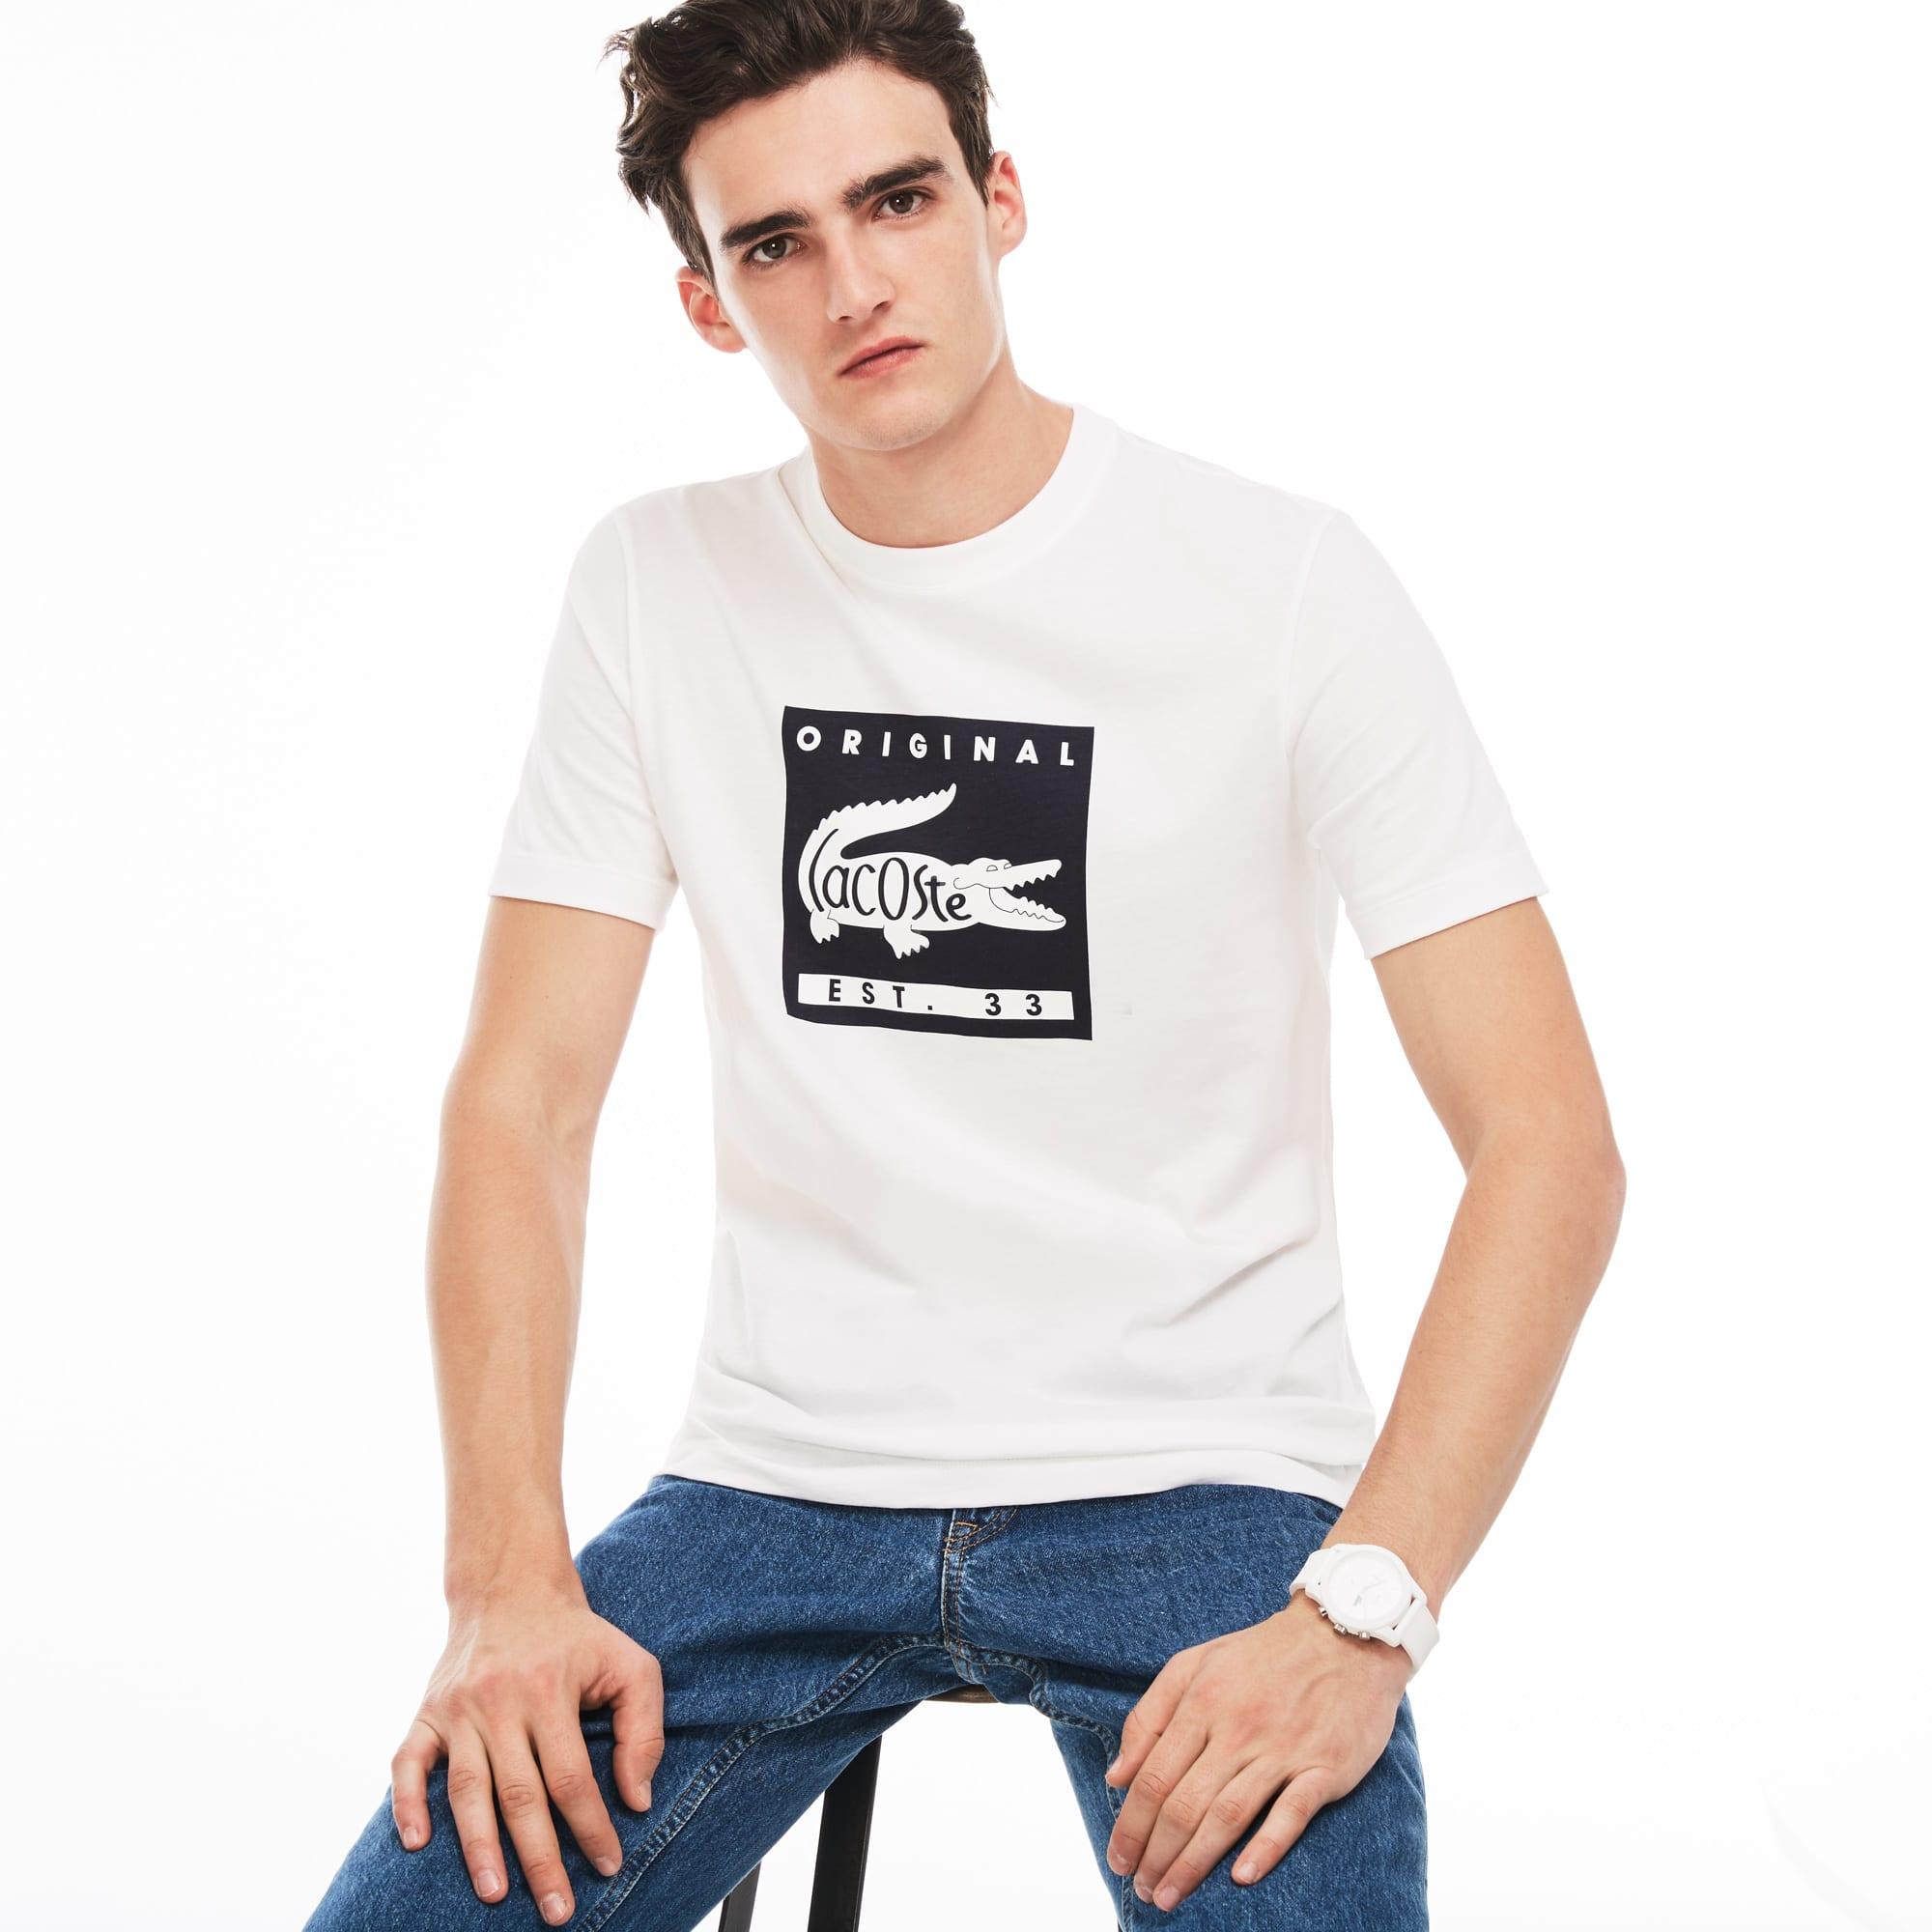 Men's Original Lettering T-Shirt